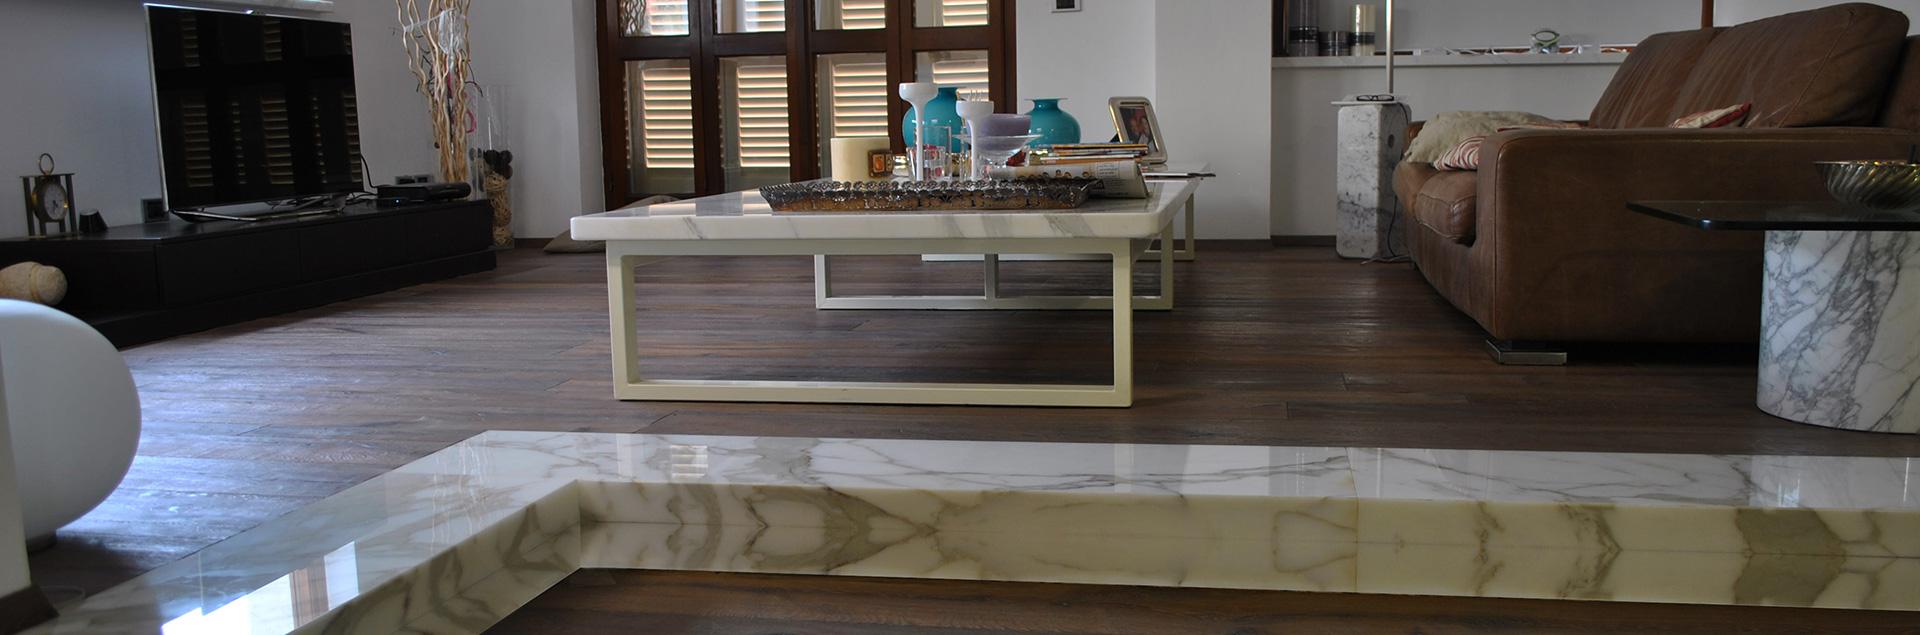 Arredamento in legno e marmo a Carrara